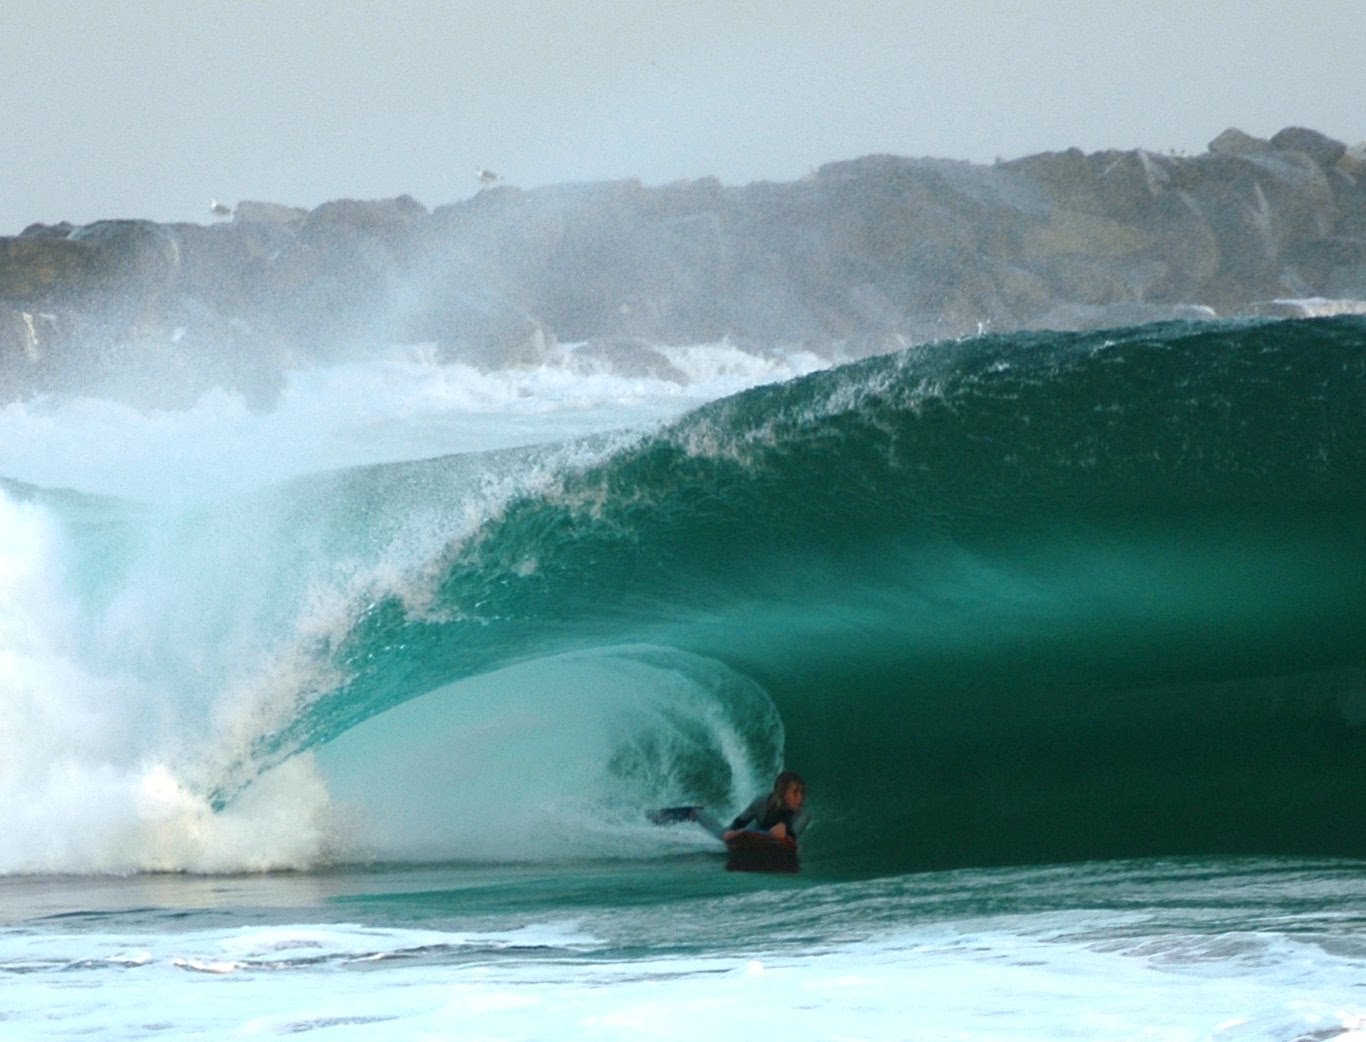 maui wave report